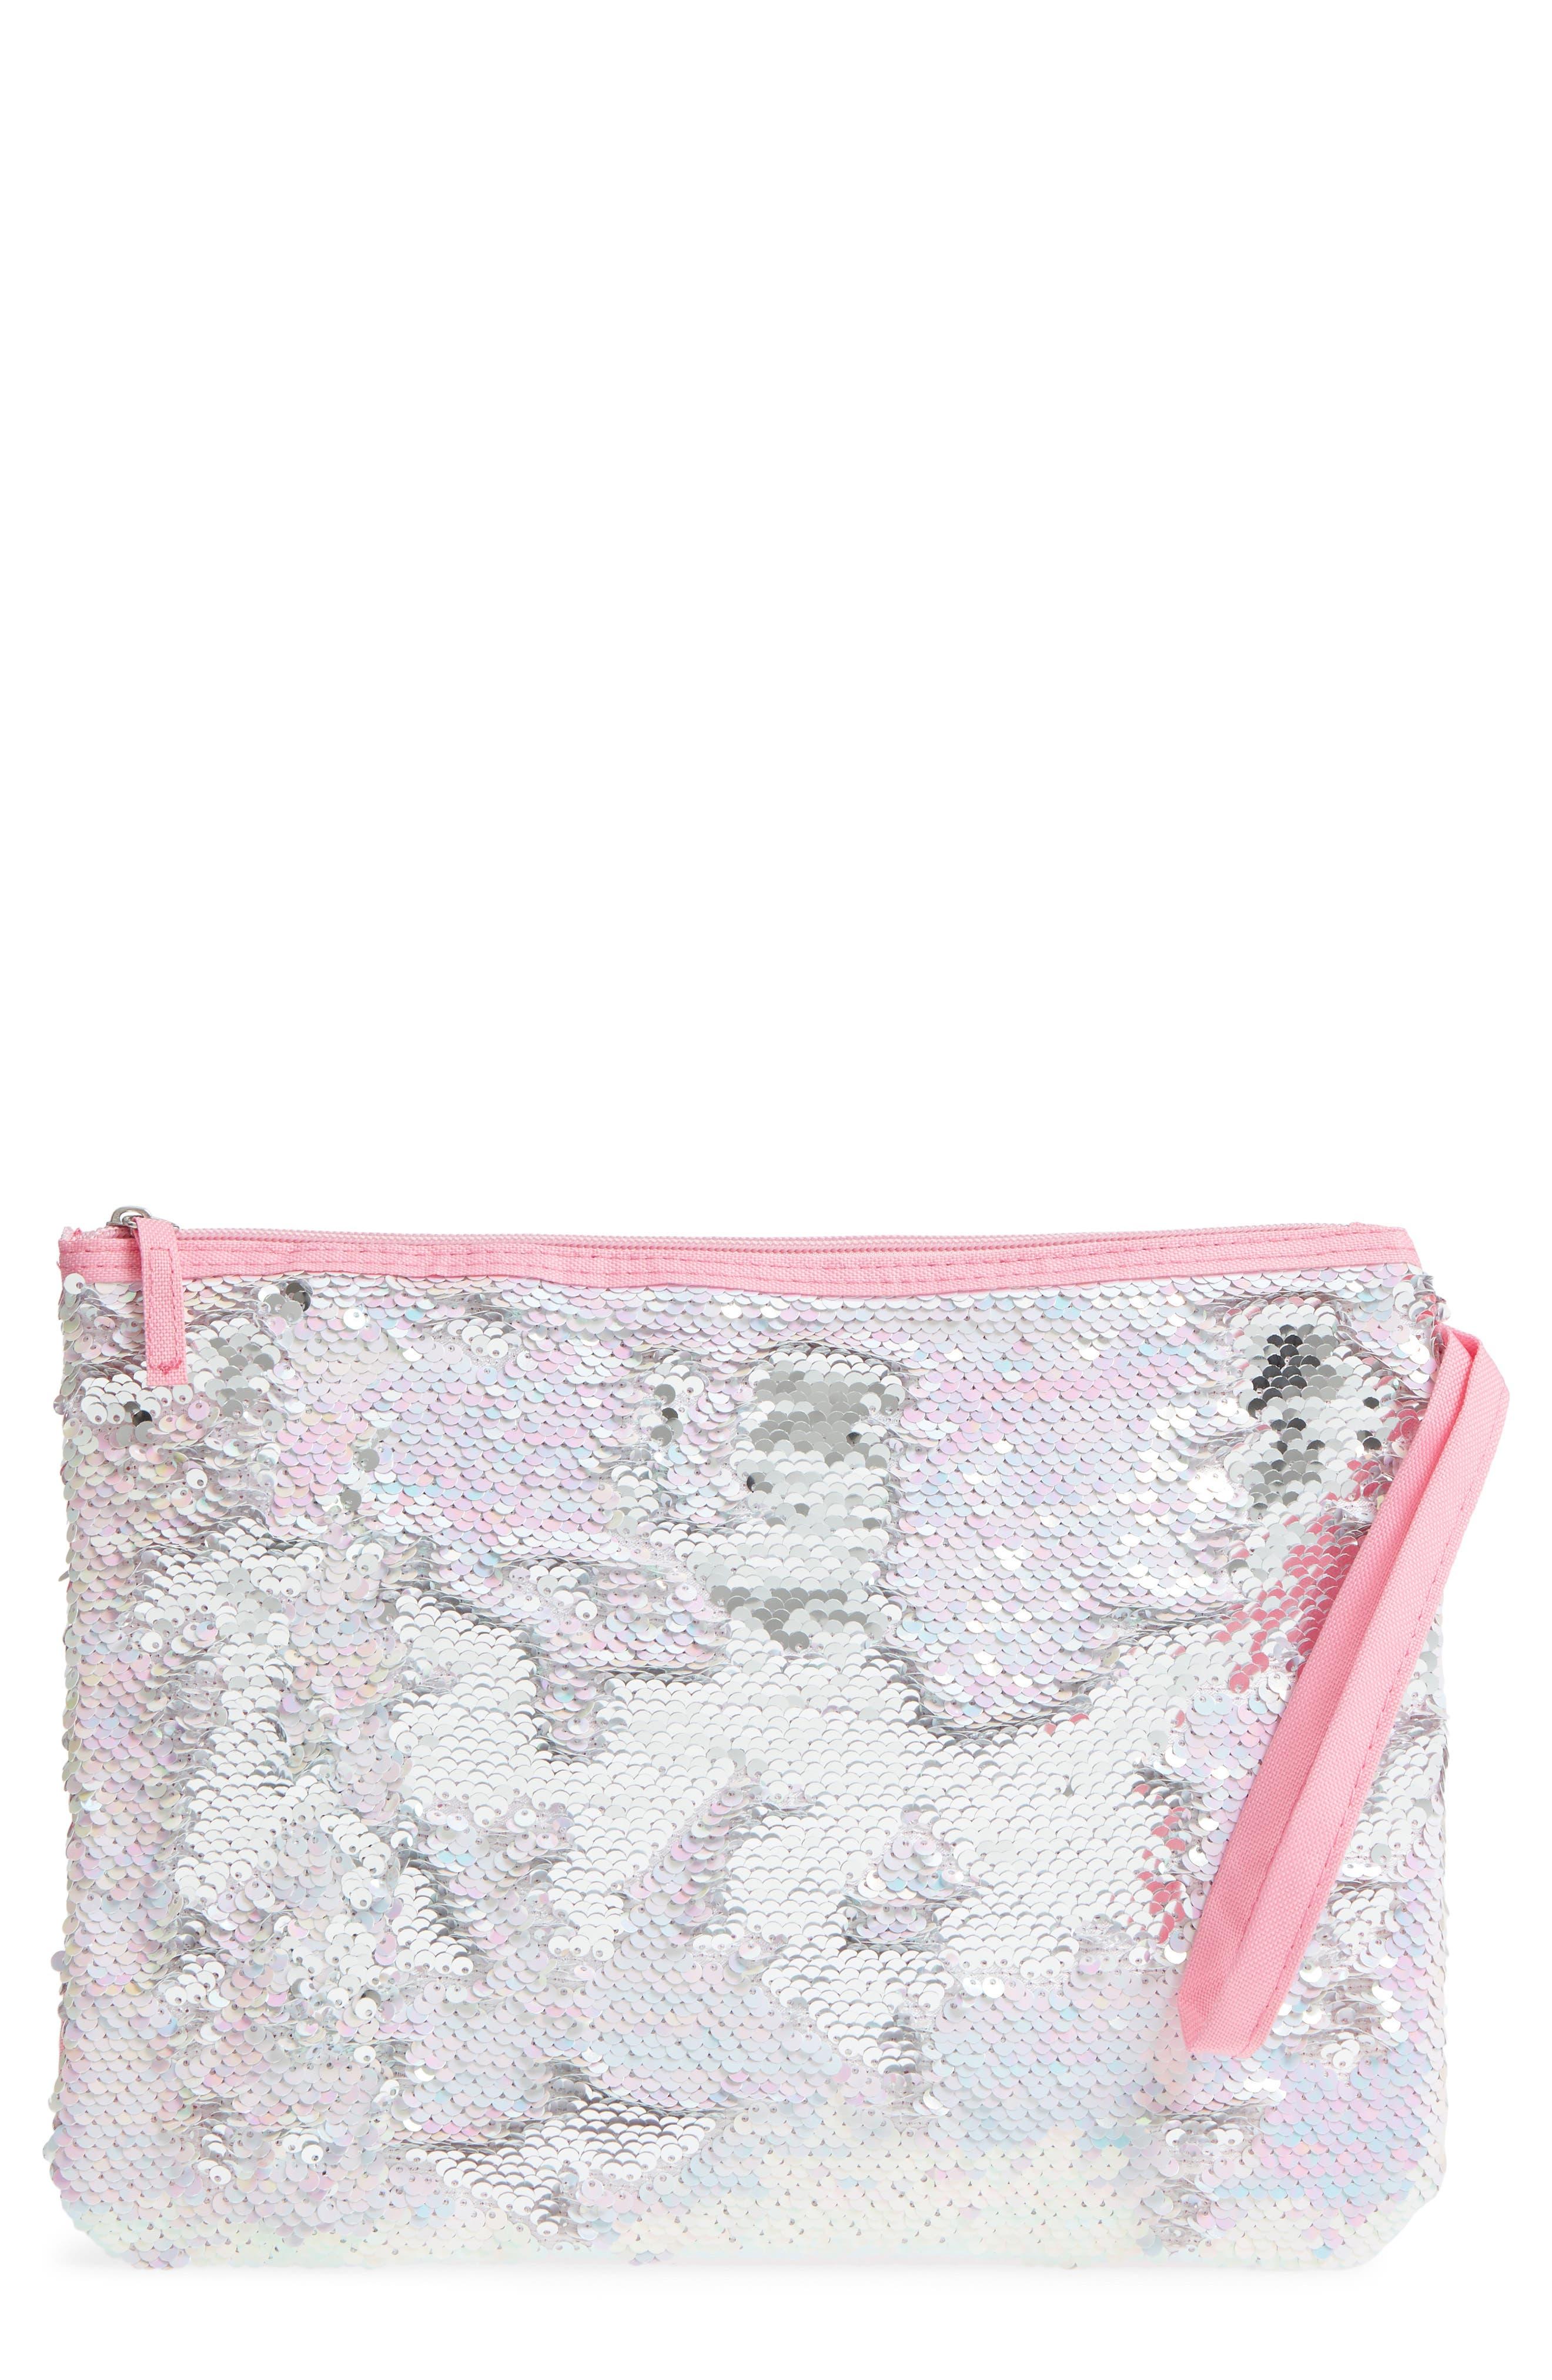 Sequin Bikini Bag,                             Main thumbnail 1, color,                             Pink Combo